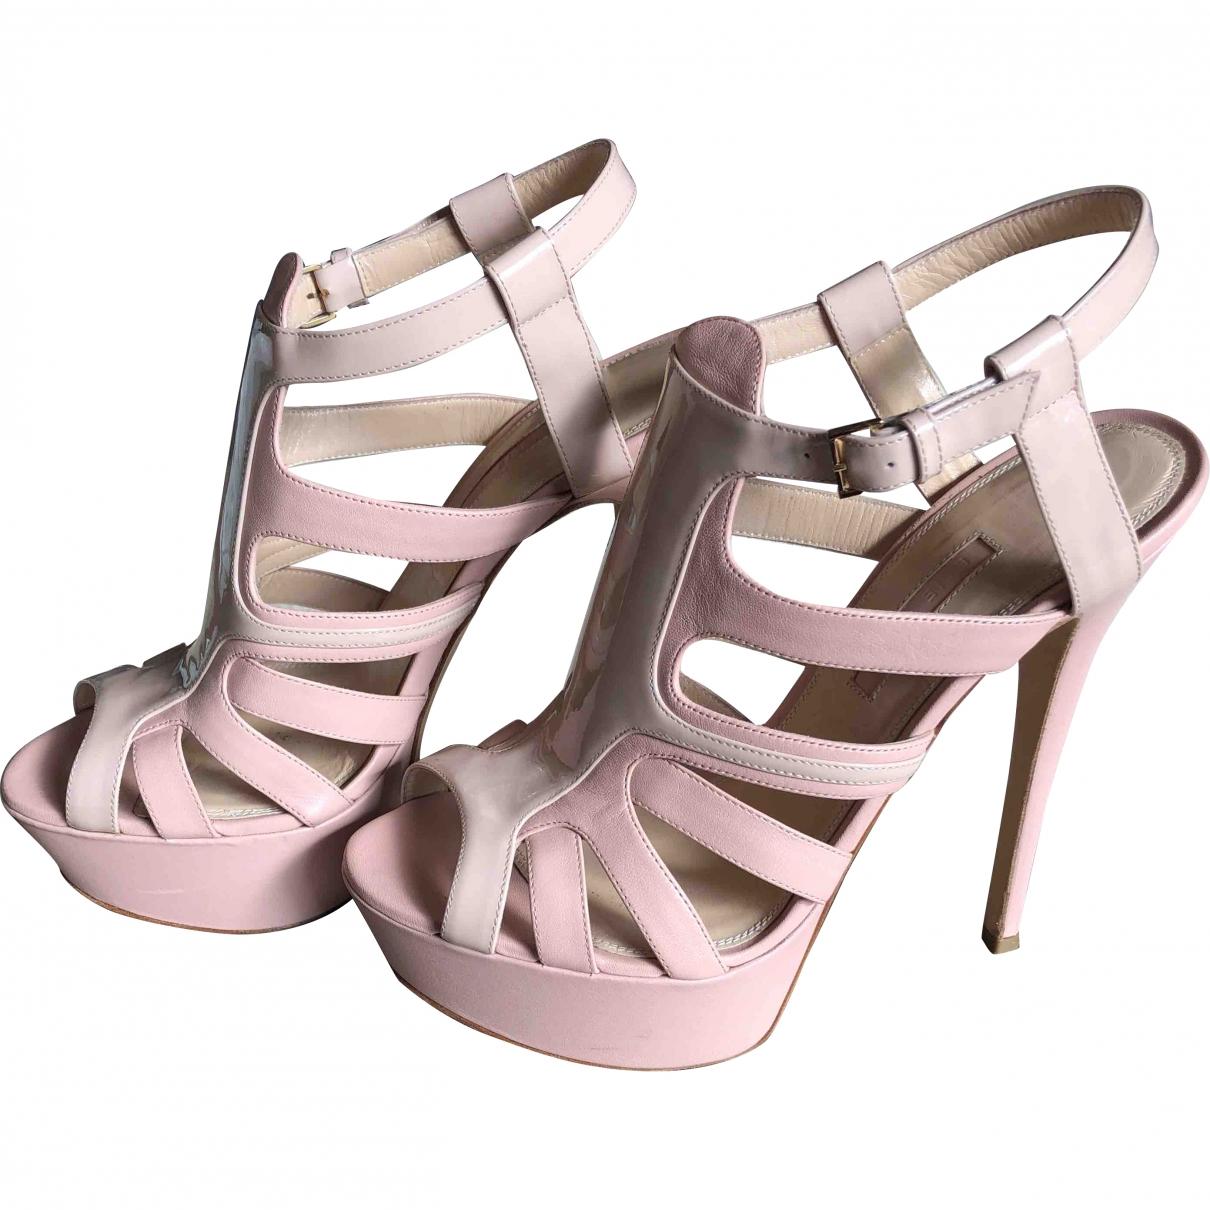 Elie Saab \N Pink Leather Sandals for Women 37 EU